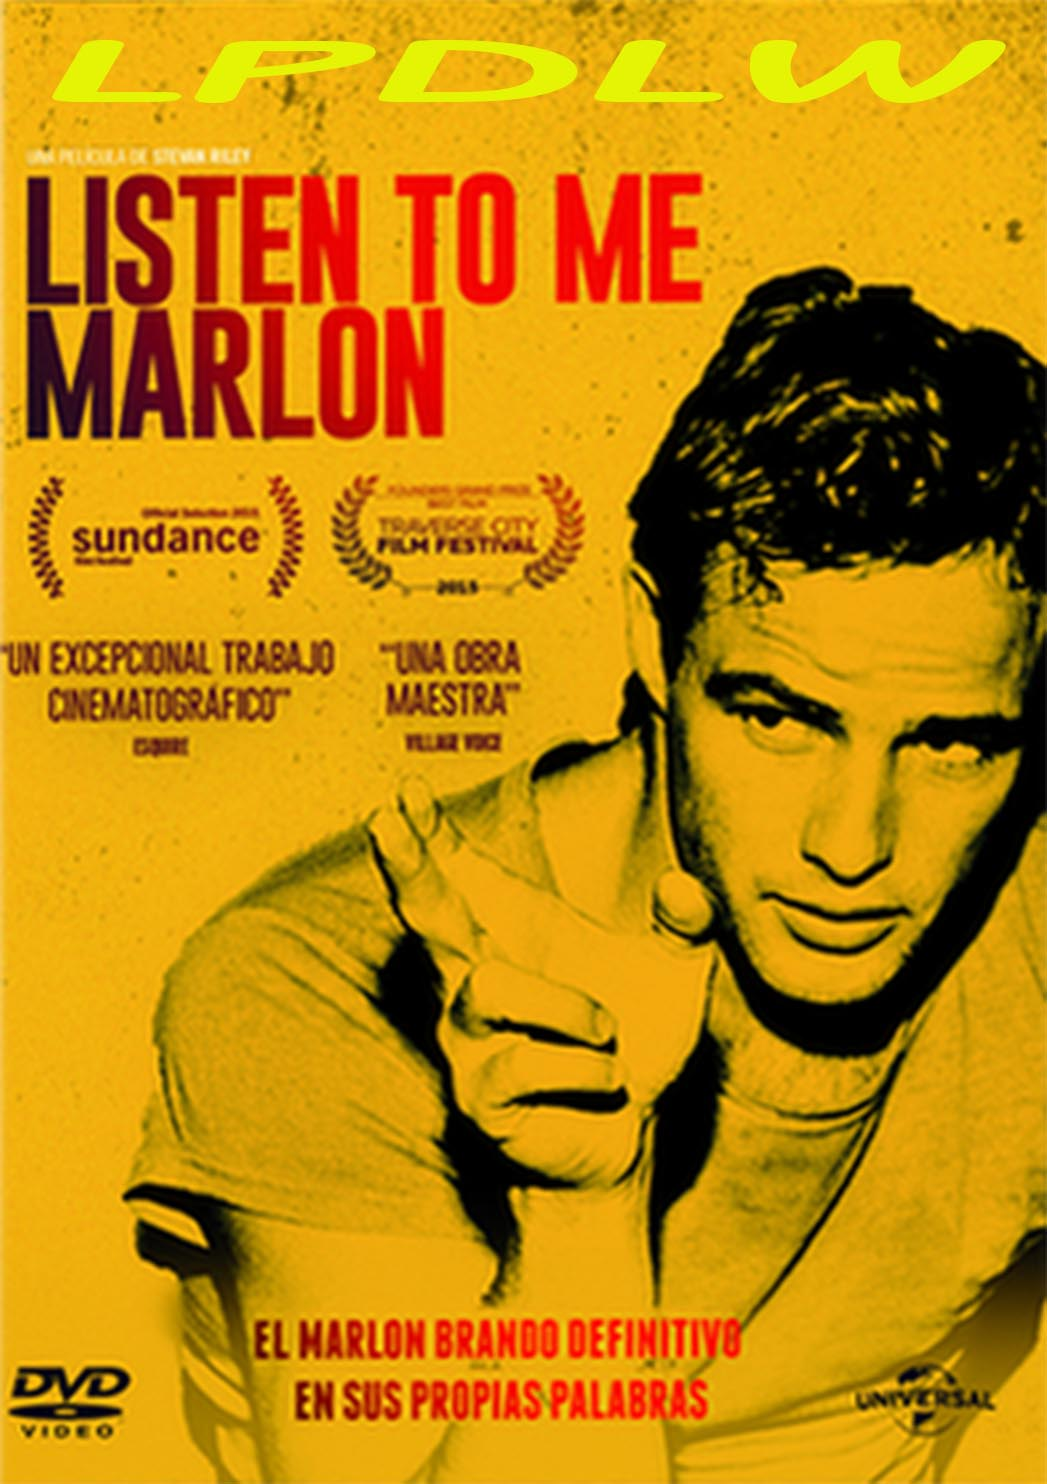 Listen to Me Marlon (2015 / Documental Sobre Marlon Brando)